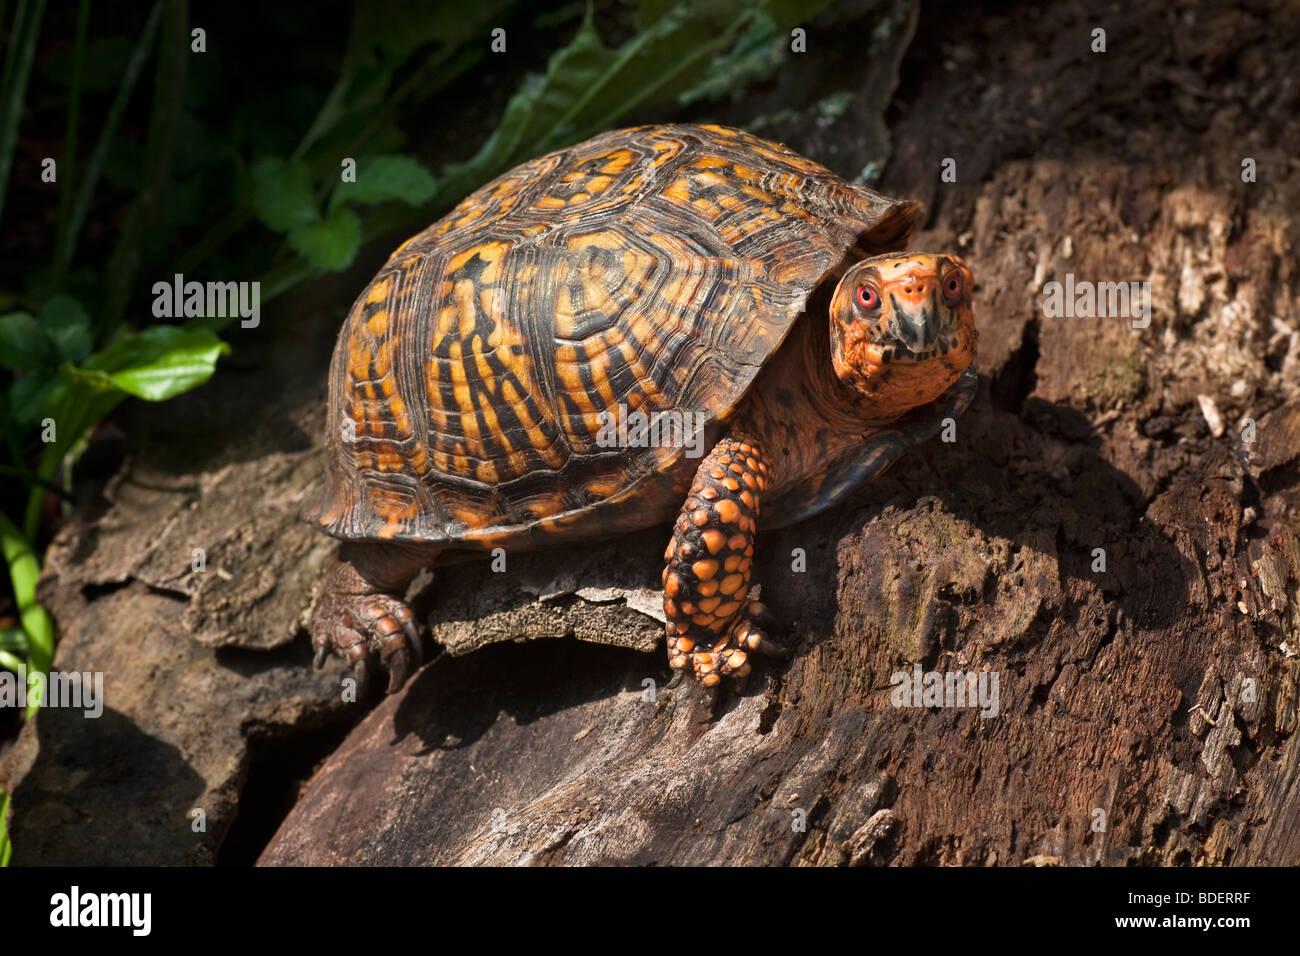 Scatola orientale tartaruga, Terrapene Carolina carolina Immagini Stock